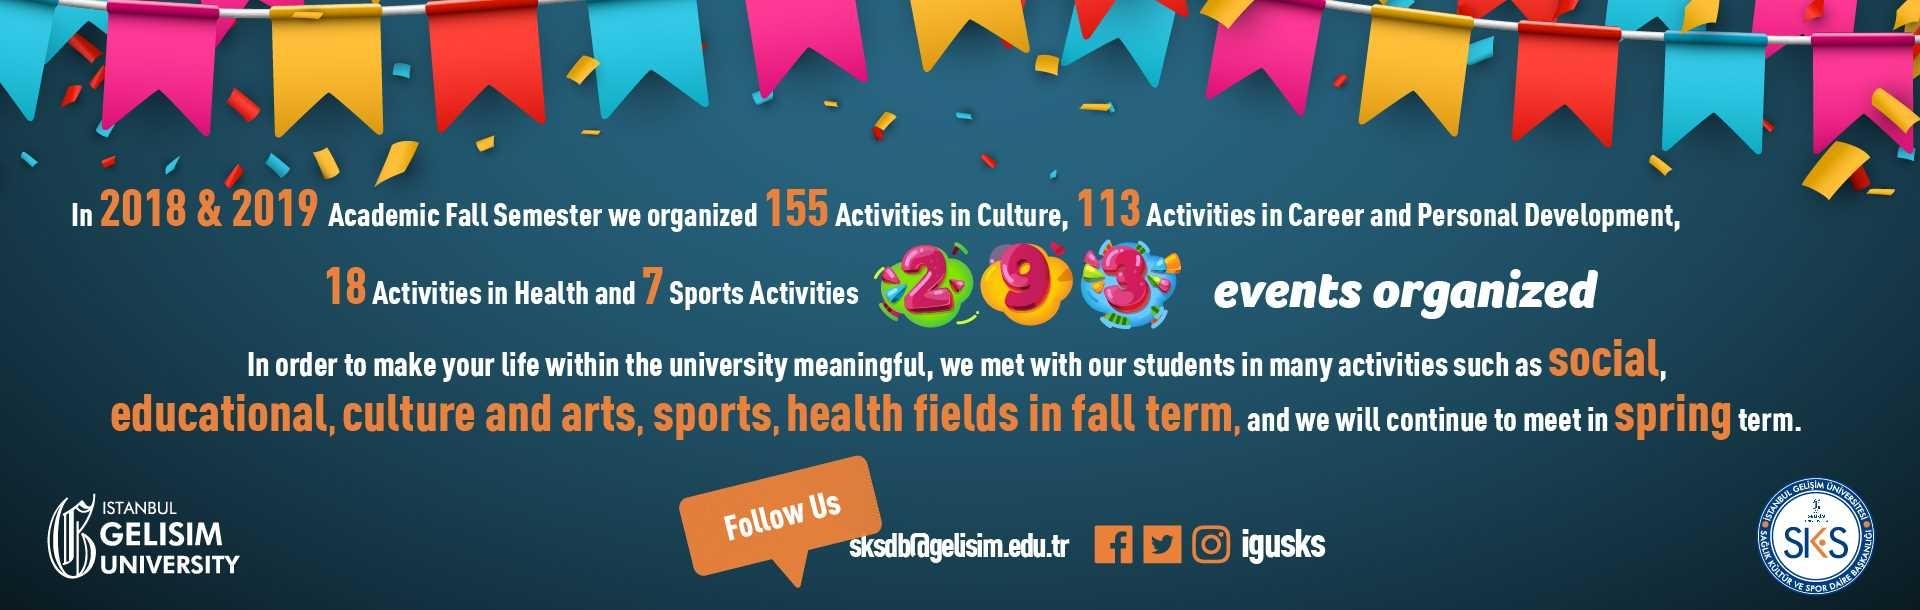 İstanbul Gelisim University SKS Activities